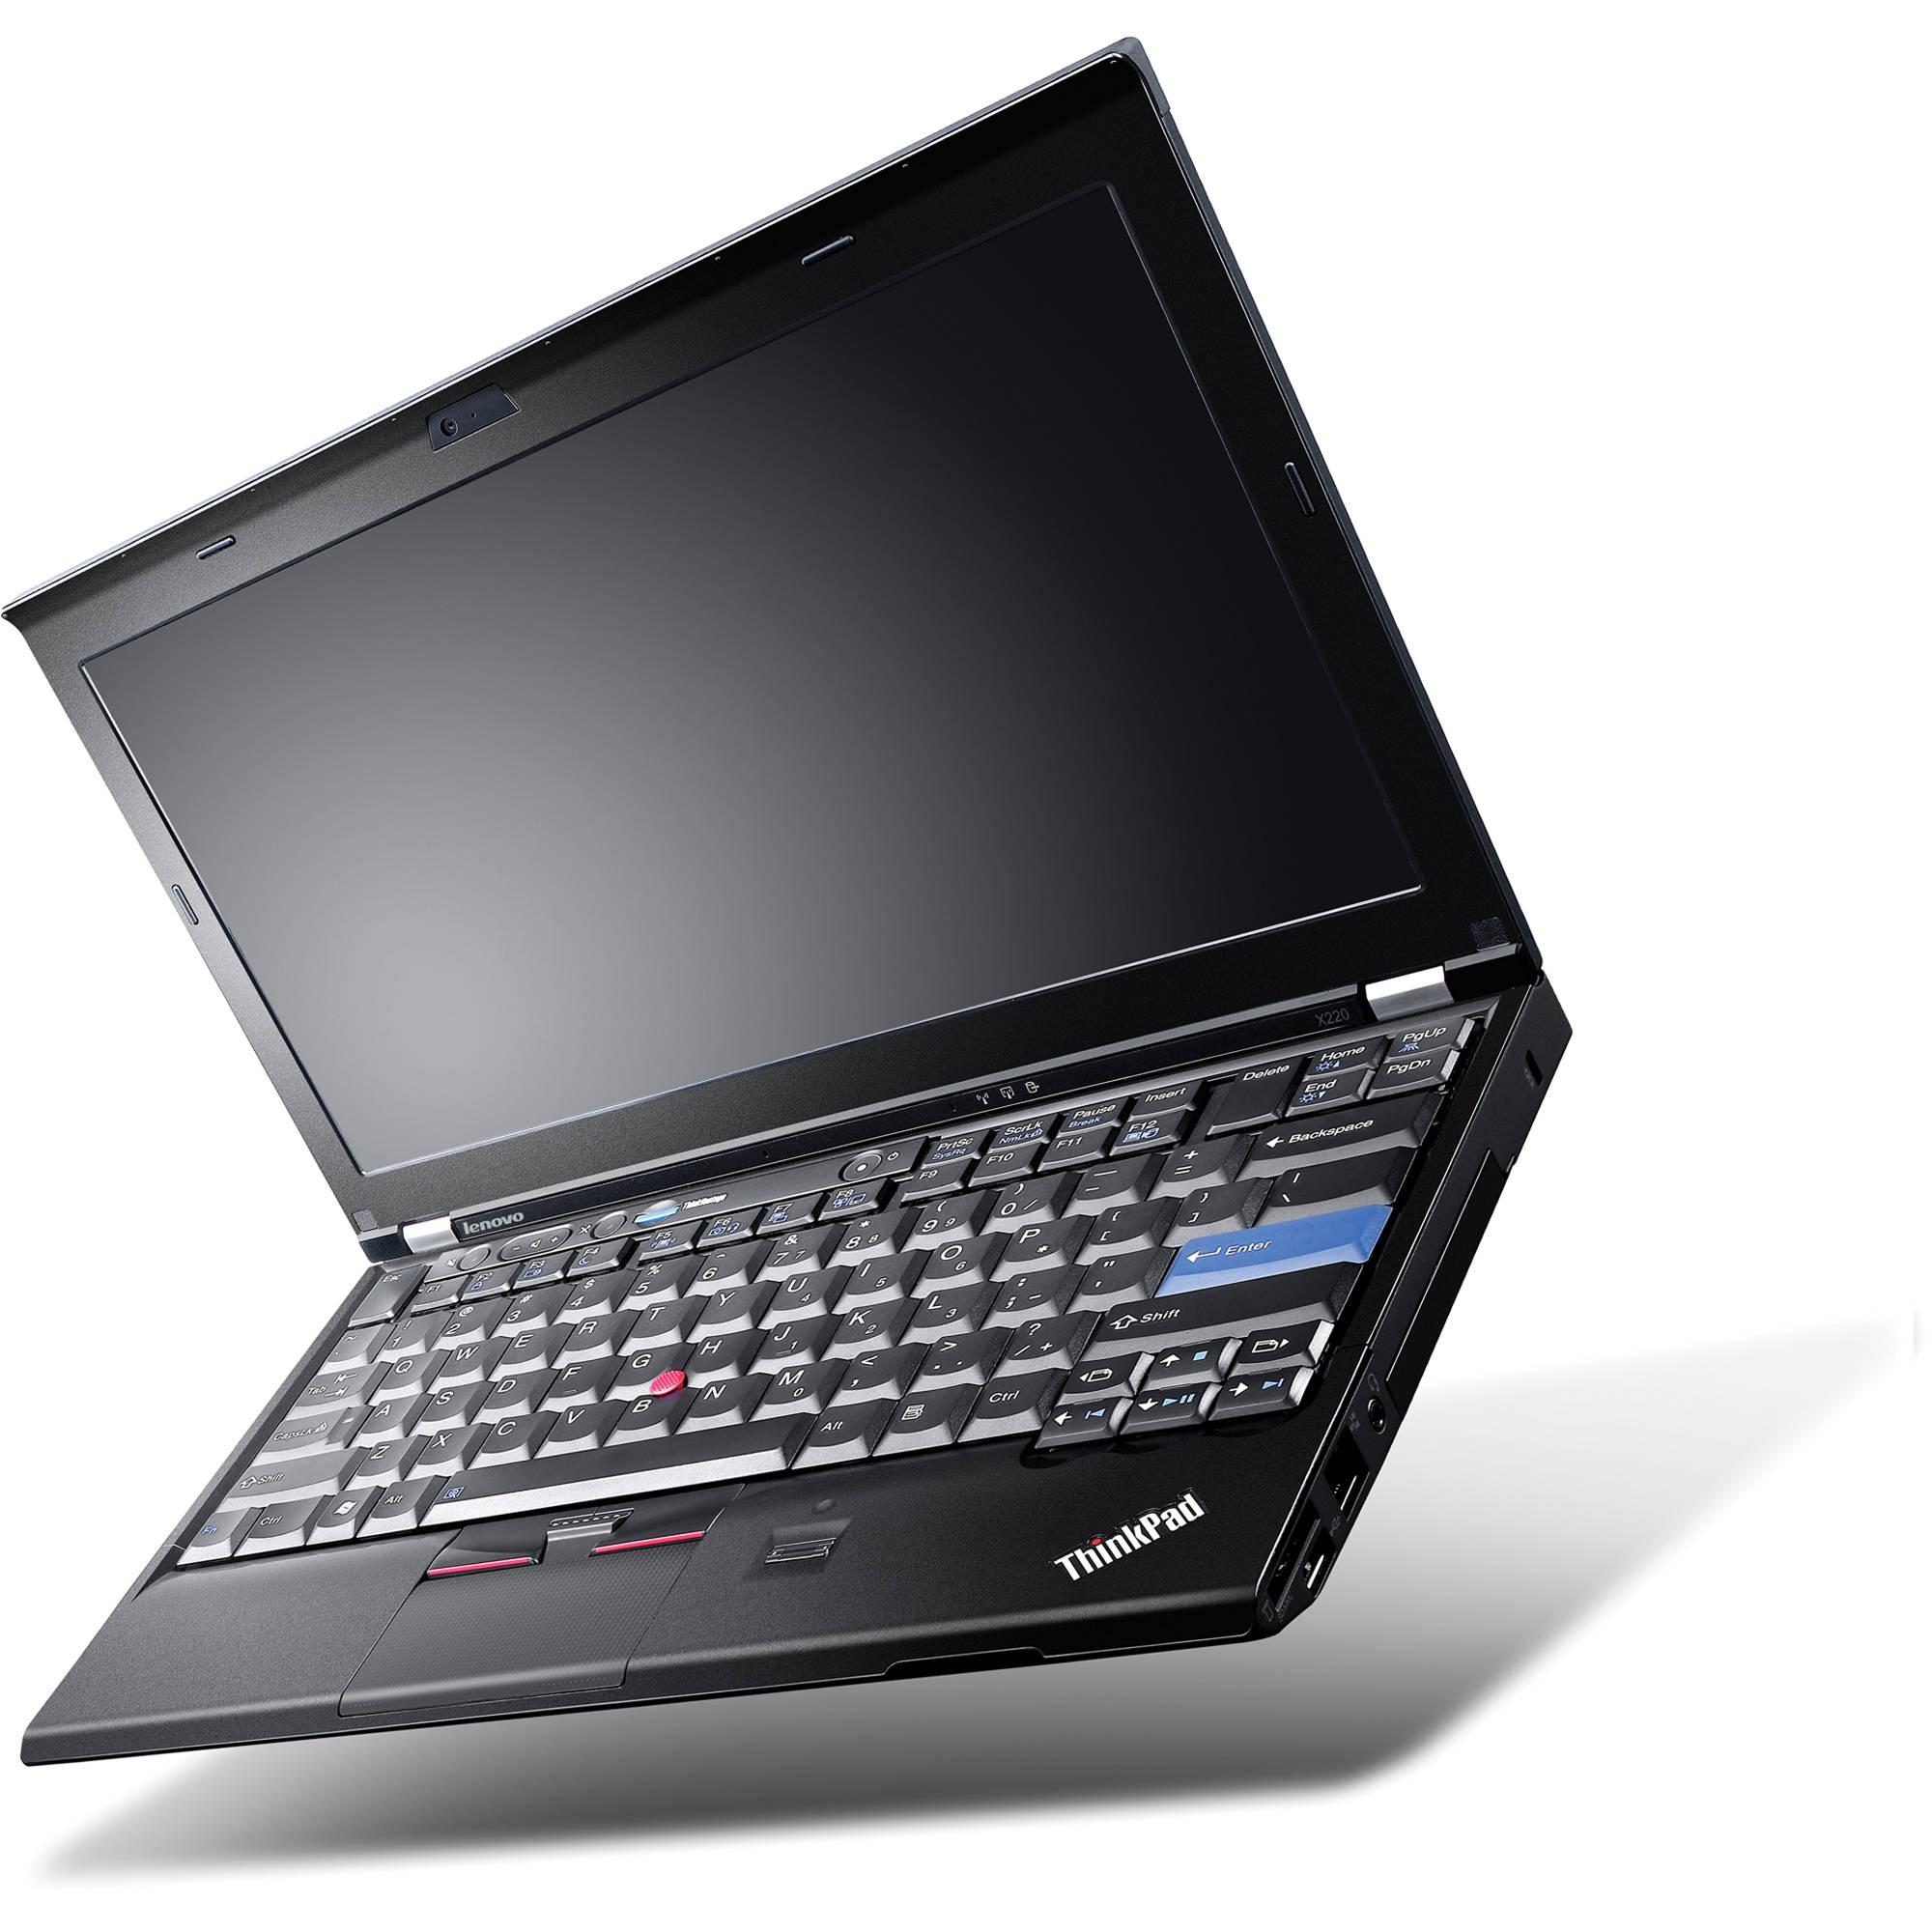 Laptop Lenovo ThinkPad X220 instrukcja obsługi TECHfresh.pl